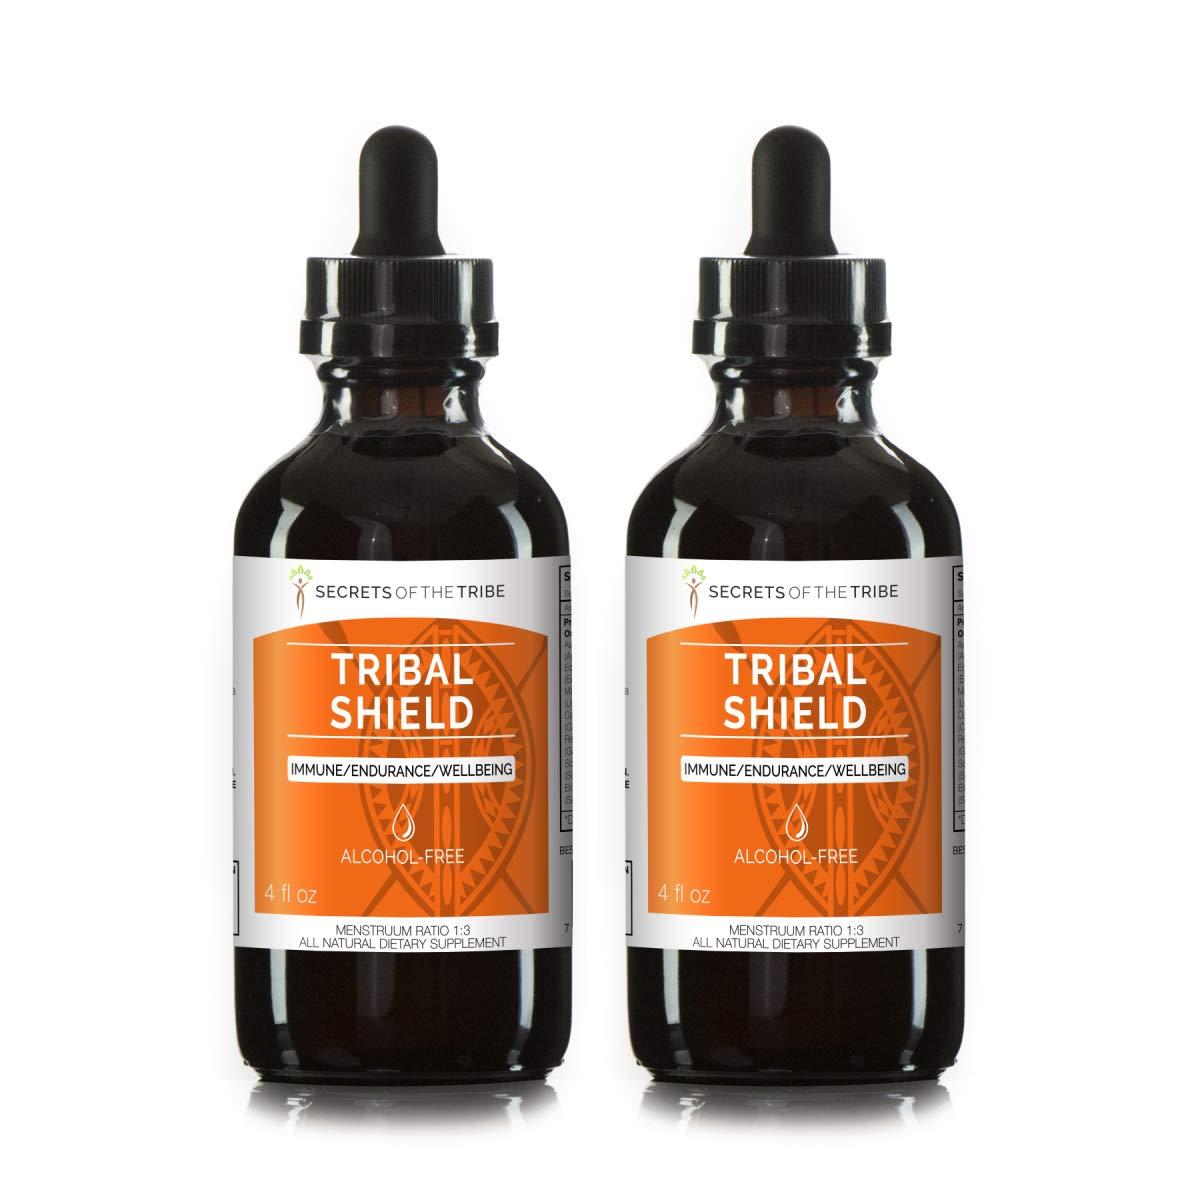 Tribal Shield Alcohol-Free, Glycerite Astragalus, Echinacea, Maca, Calendula, Reishi, Schisandra, Elderberry. Tincture, Herbal Extract Immune/Endurance/Wellbeing (2x4 FL OZ)